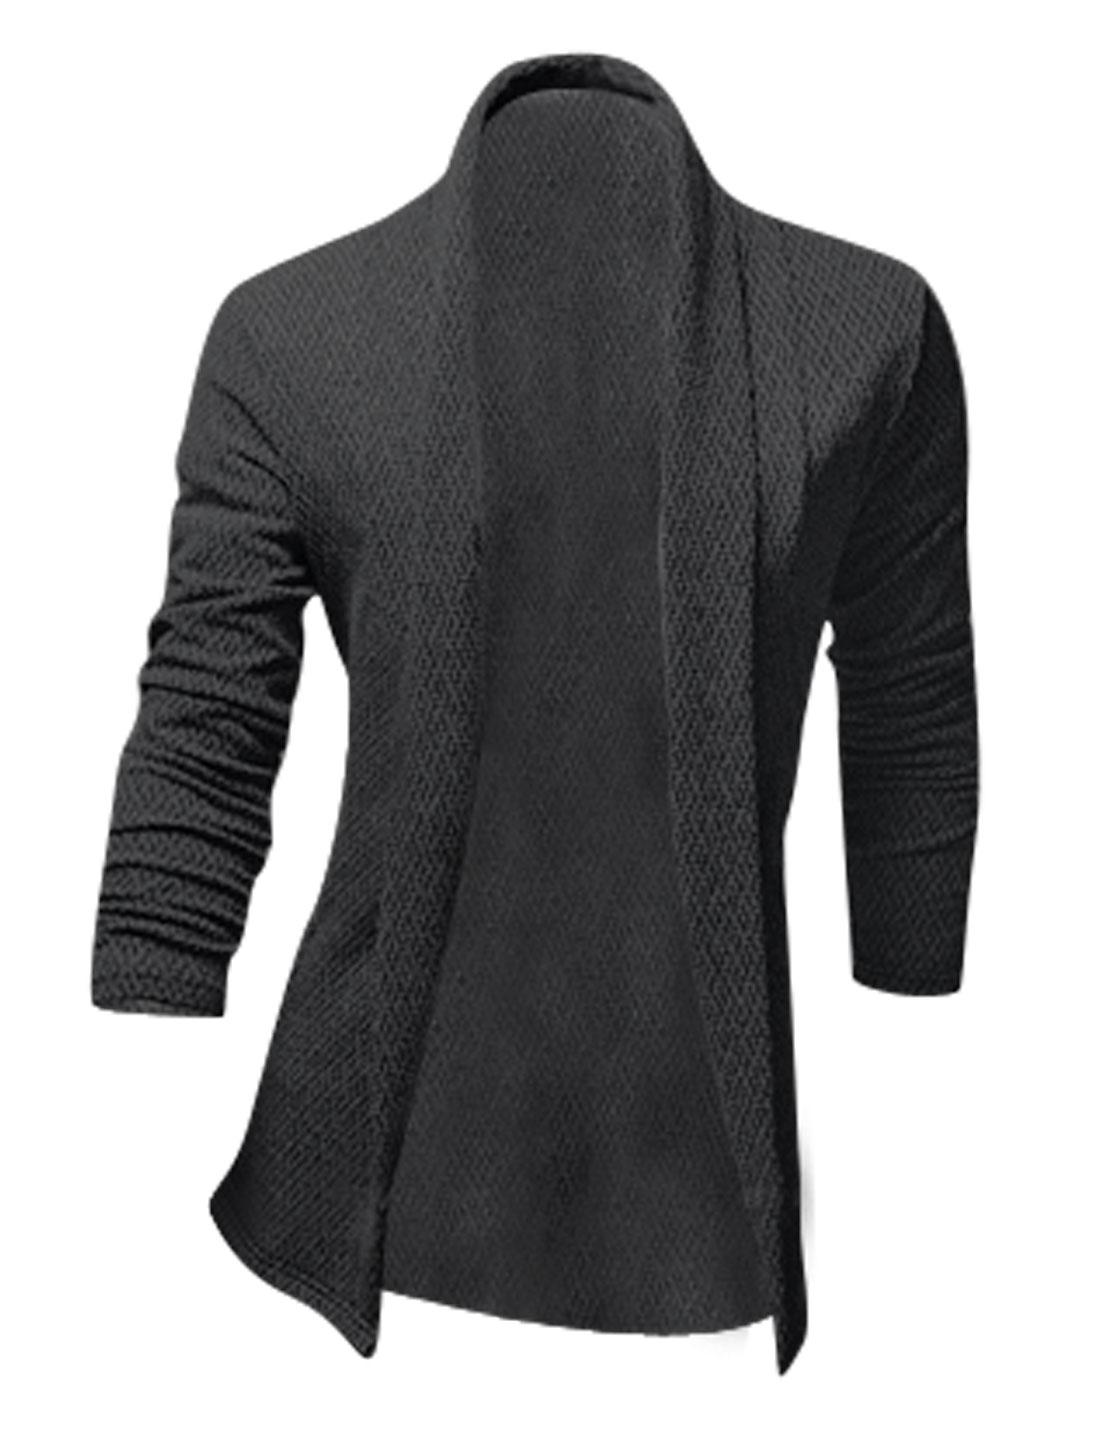 Men Shawl Collar Long Sleeve Front Opening Chic Cardigan Black M